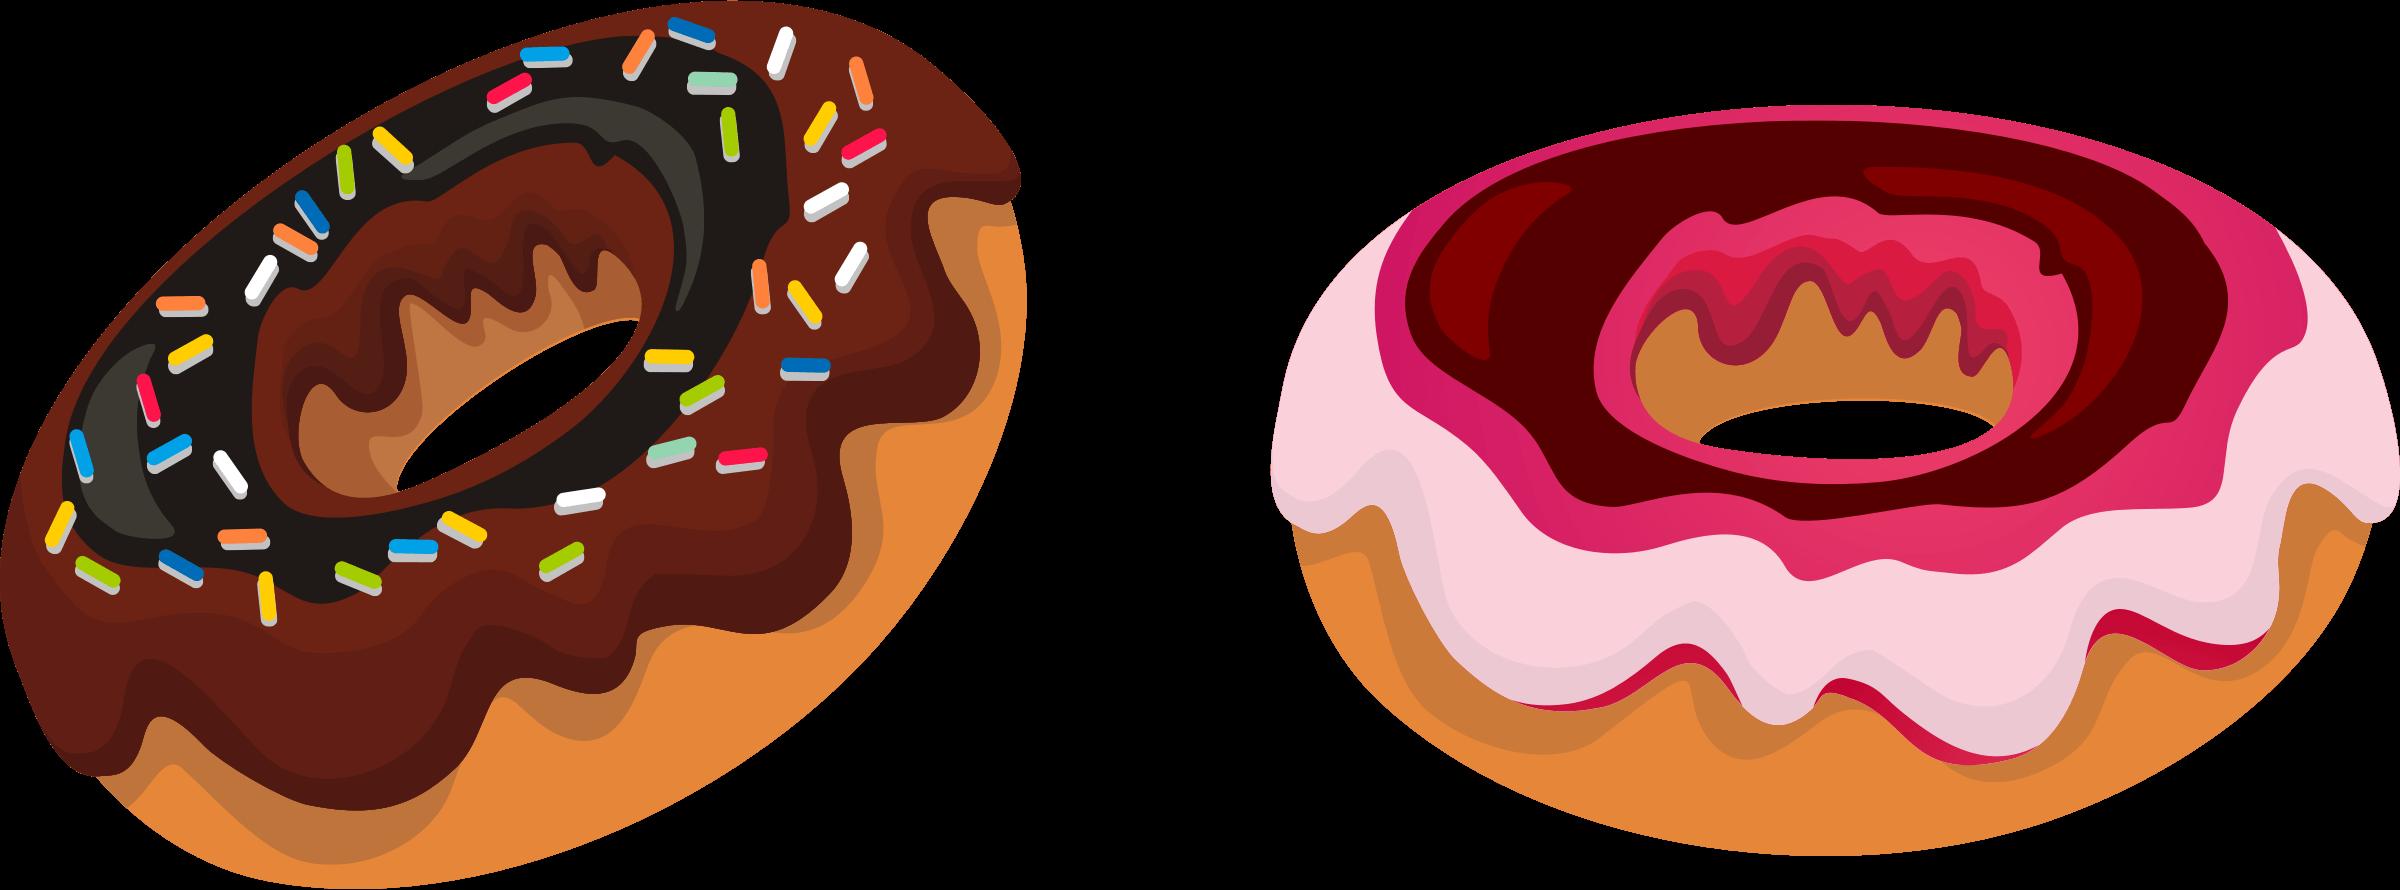 Dozen donuts cliparts image. Donut clipart outline